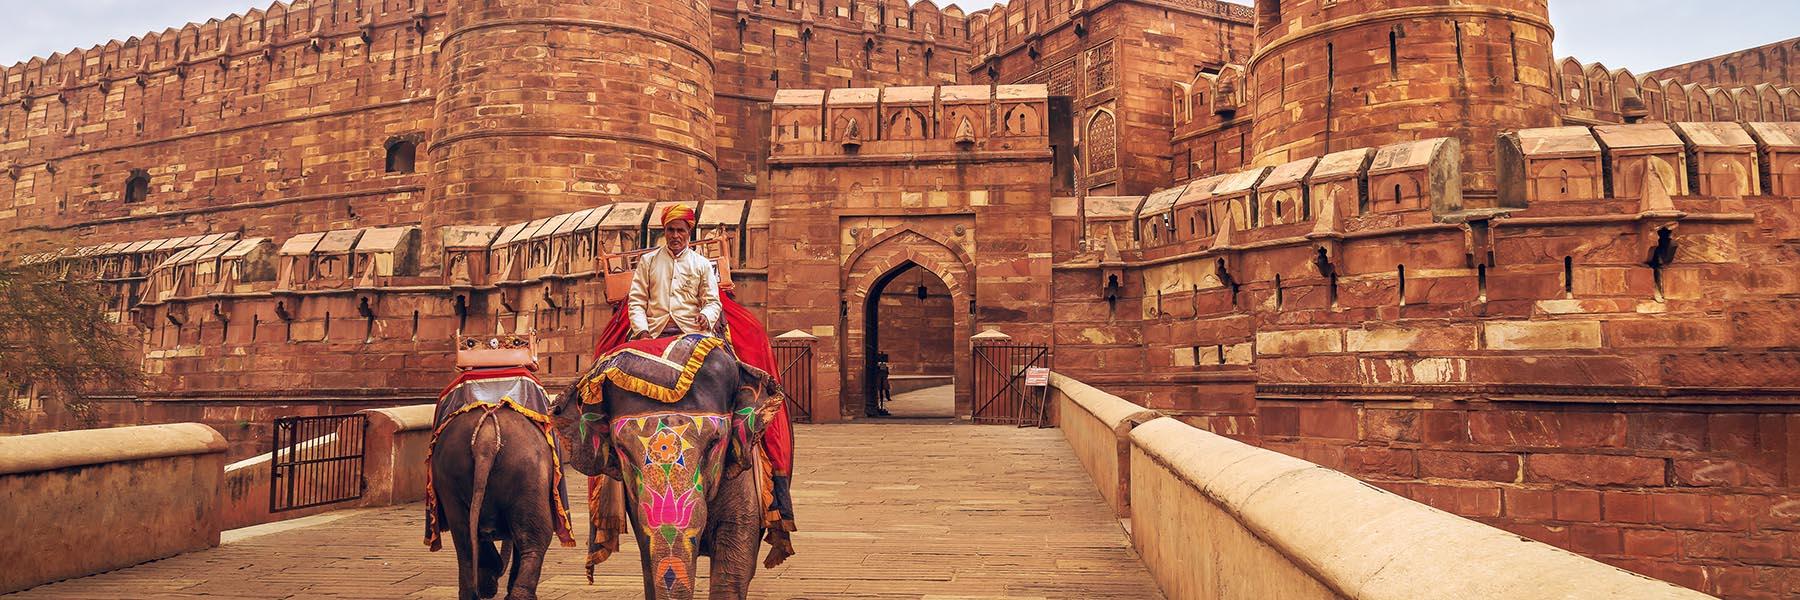 Best India Tours